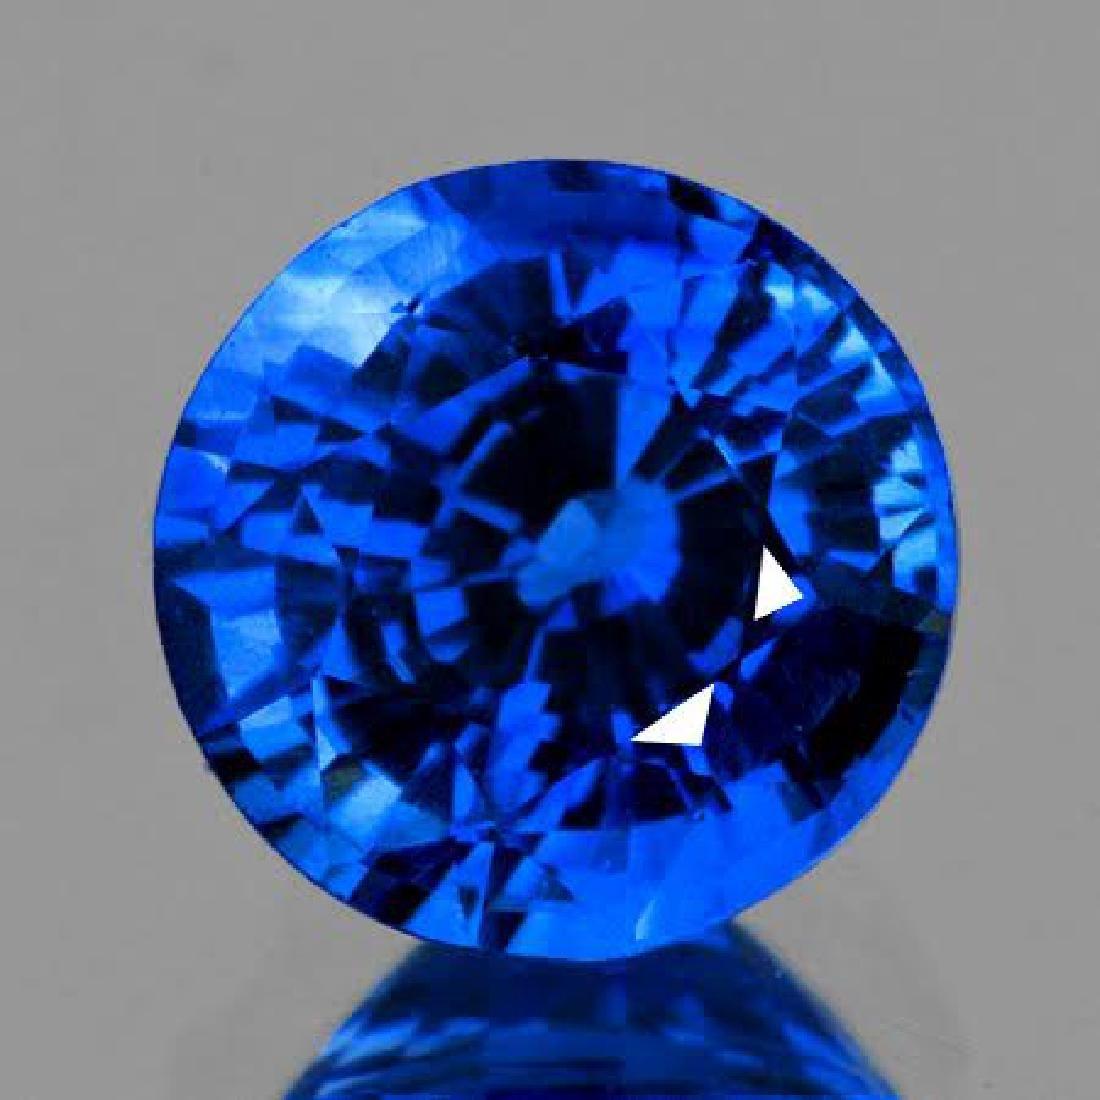 Natural Kashmir Sapphire 1.00 Carats - VVS